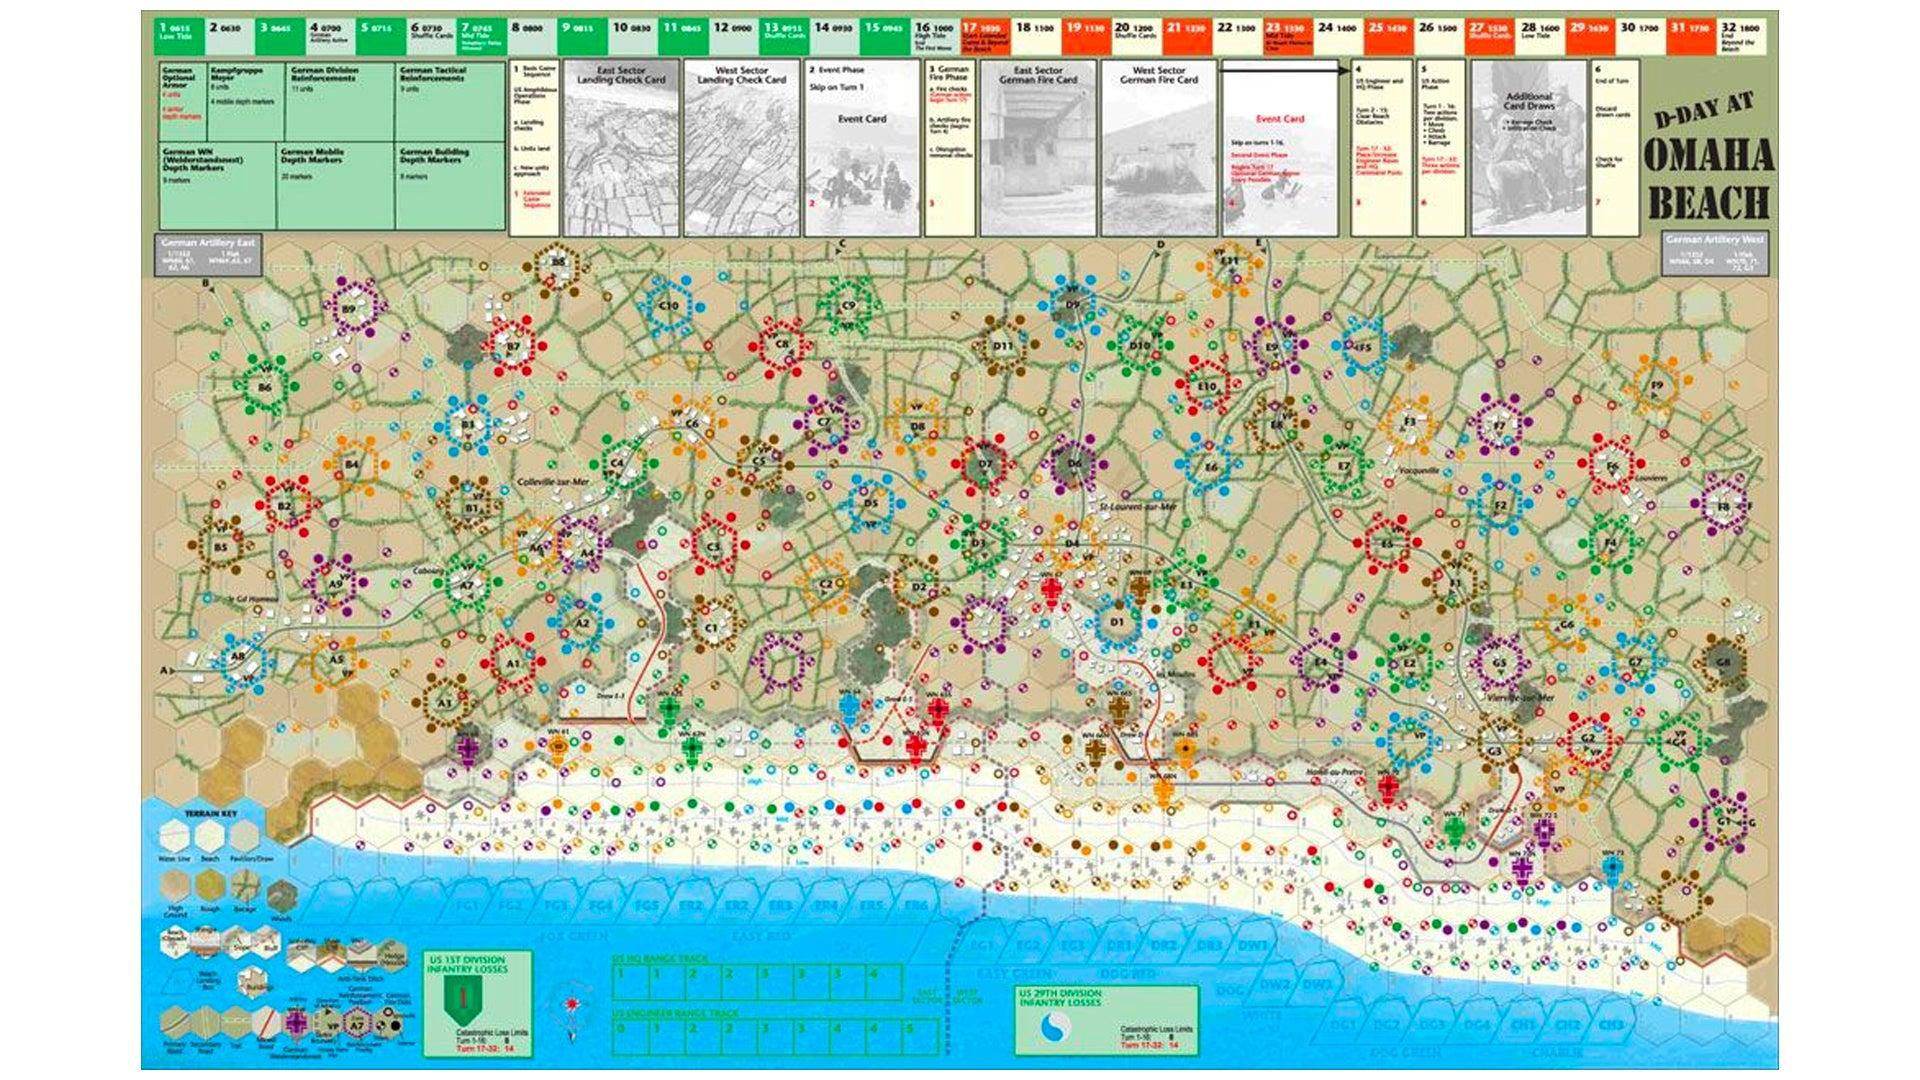 d-day-at-omaha-beach-board-game-map.jpg